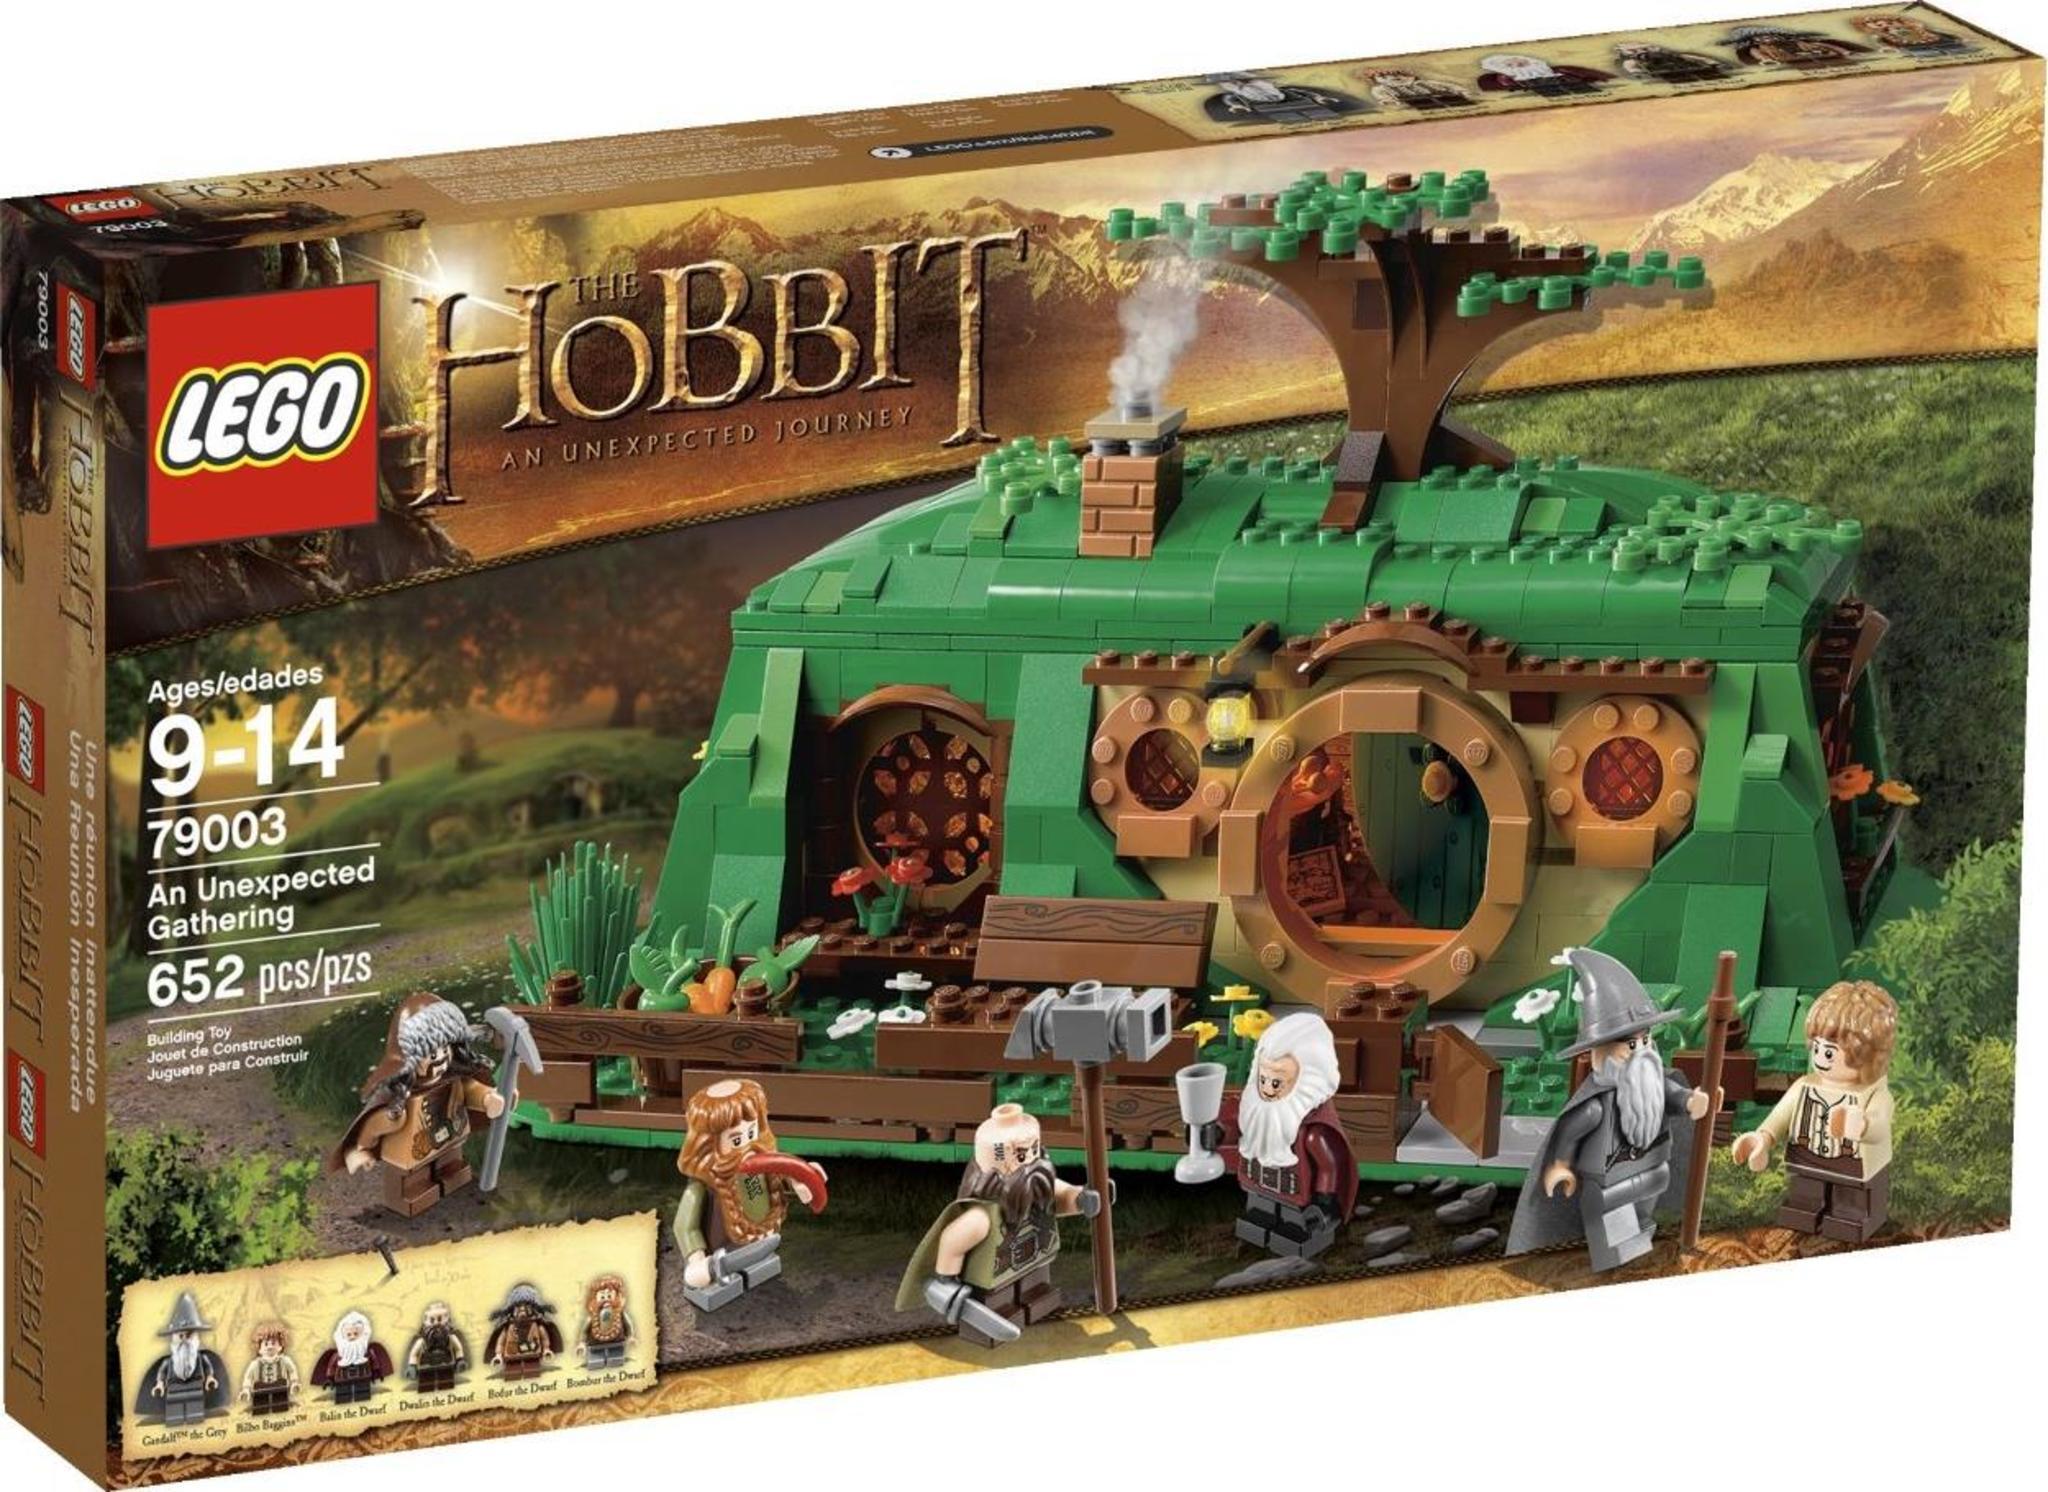 Lego The Hobbit 79003 An Unexpected Gathering Mattonito